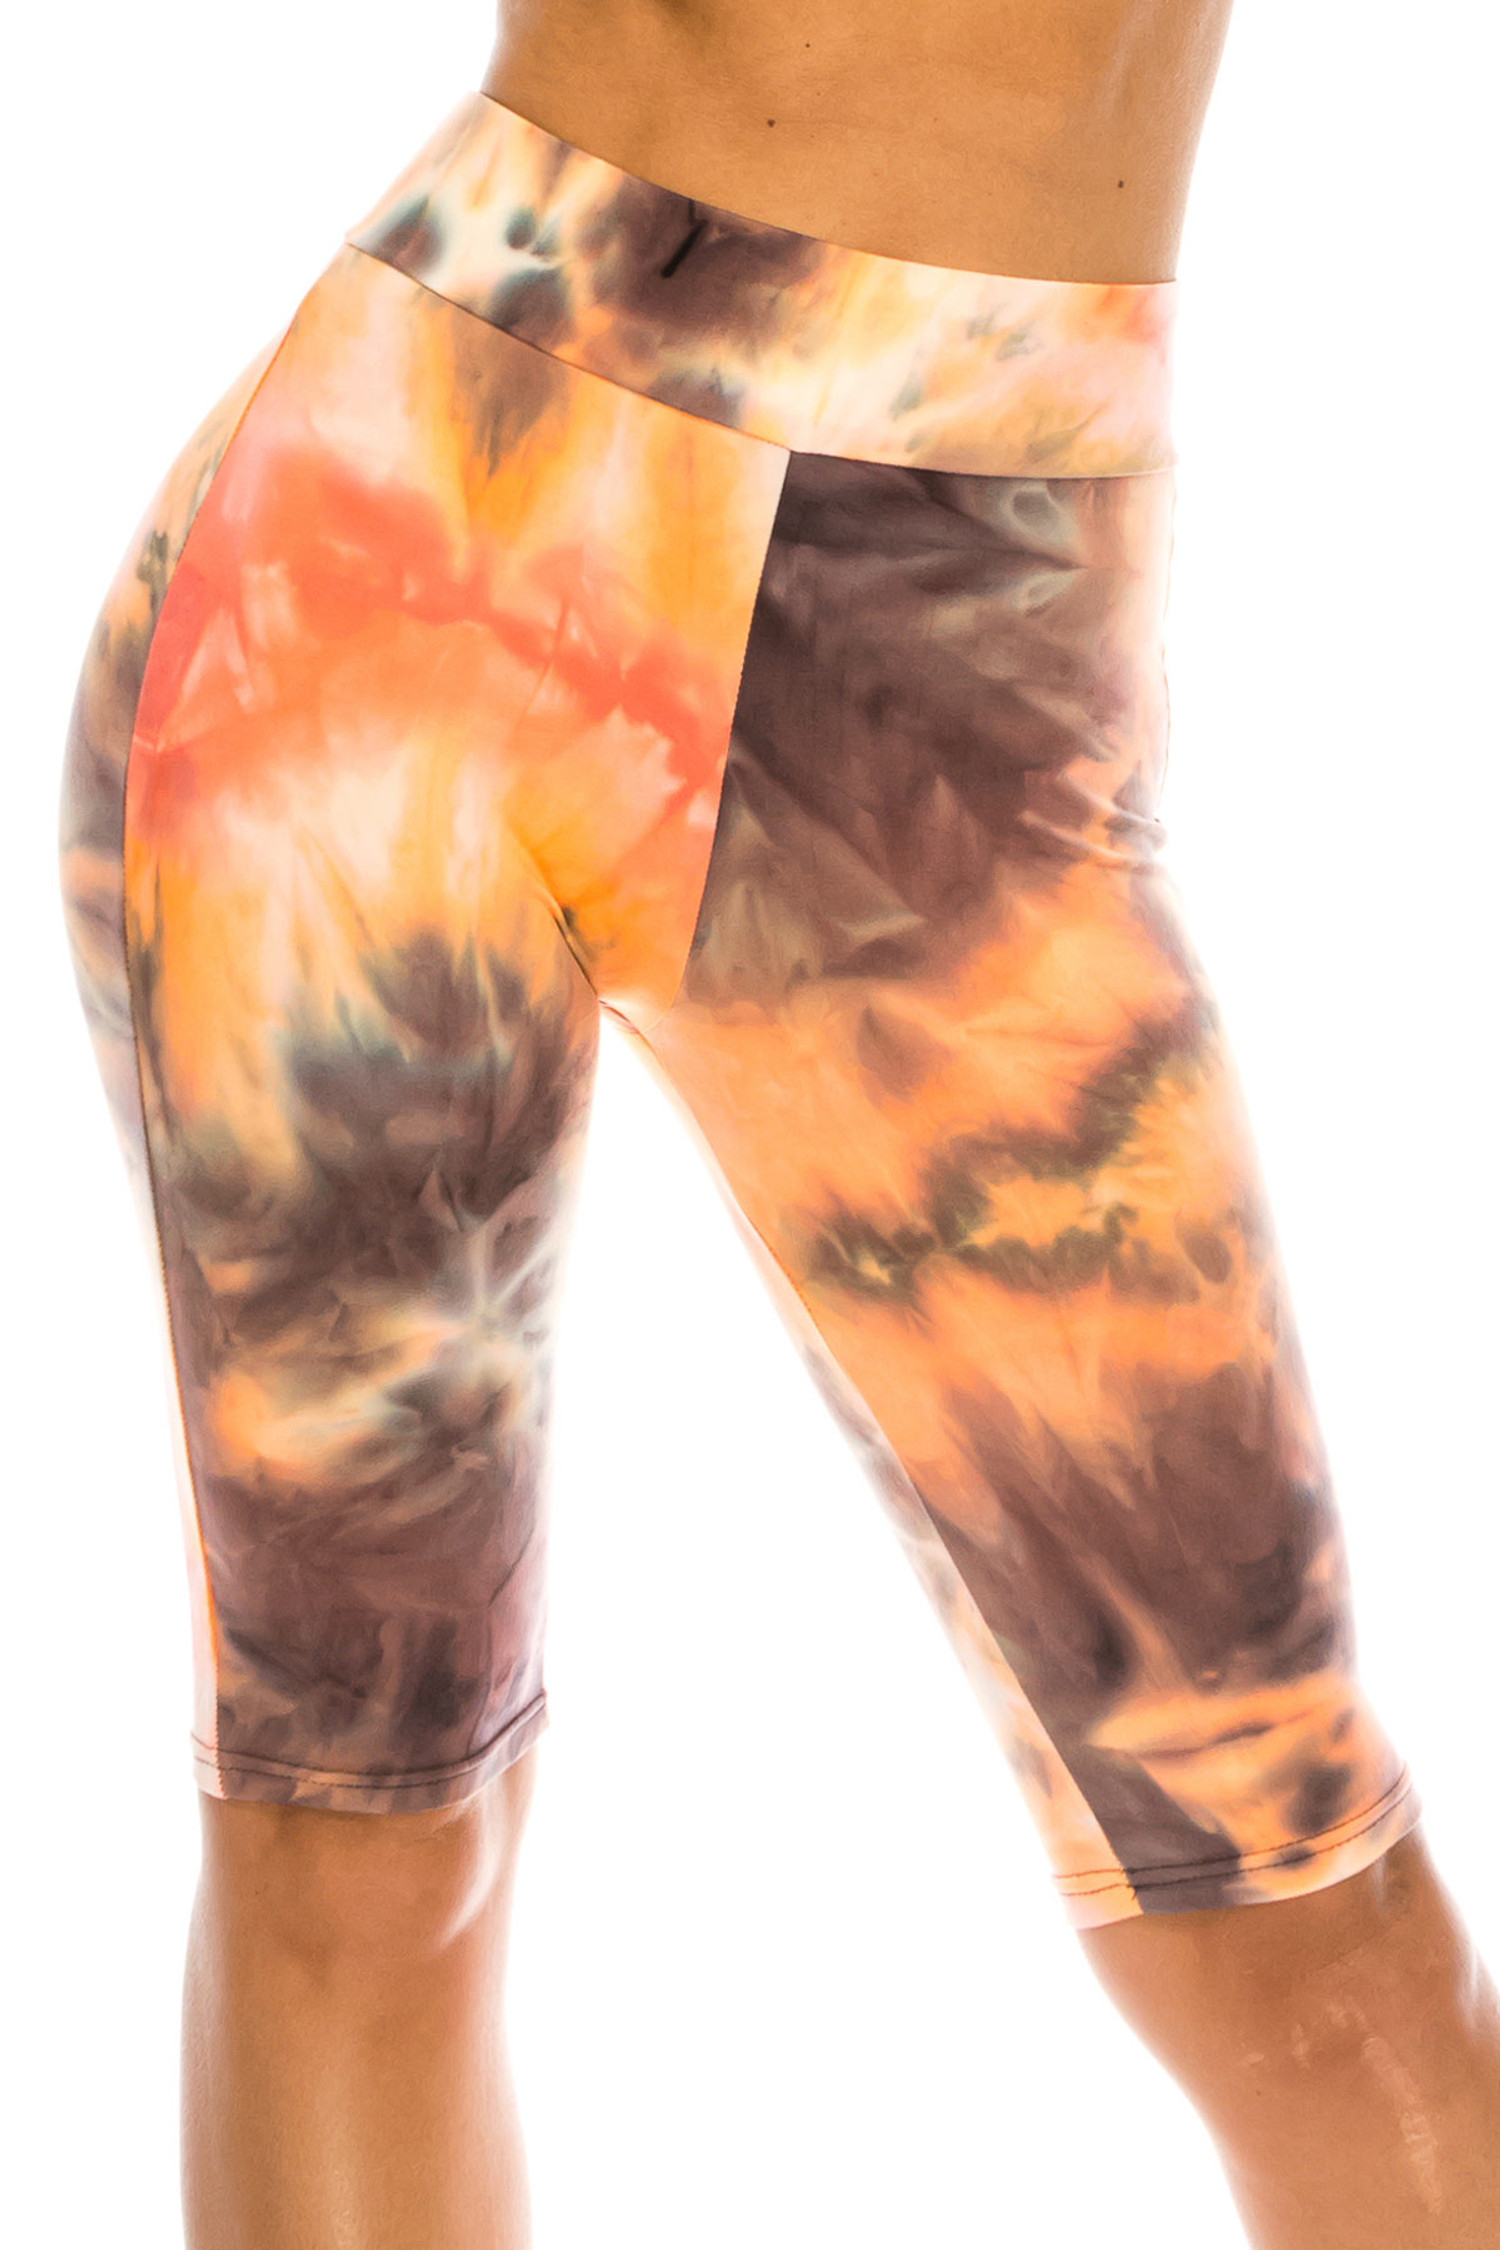 Buttery Soft Creamsicle Tie Dye High Waisted Biker Shorts - 3 Inch Waist